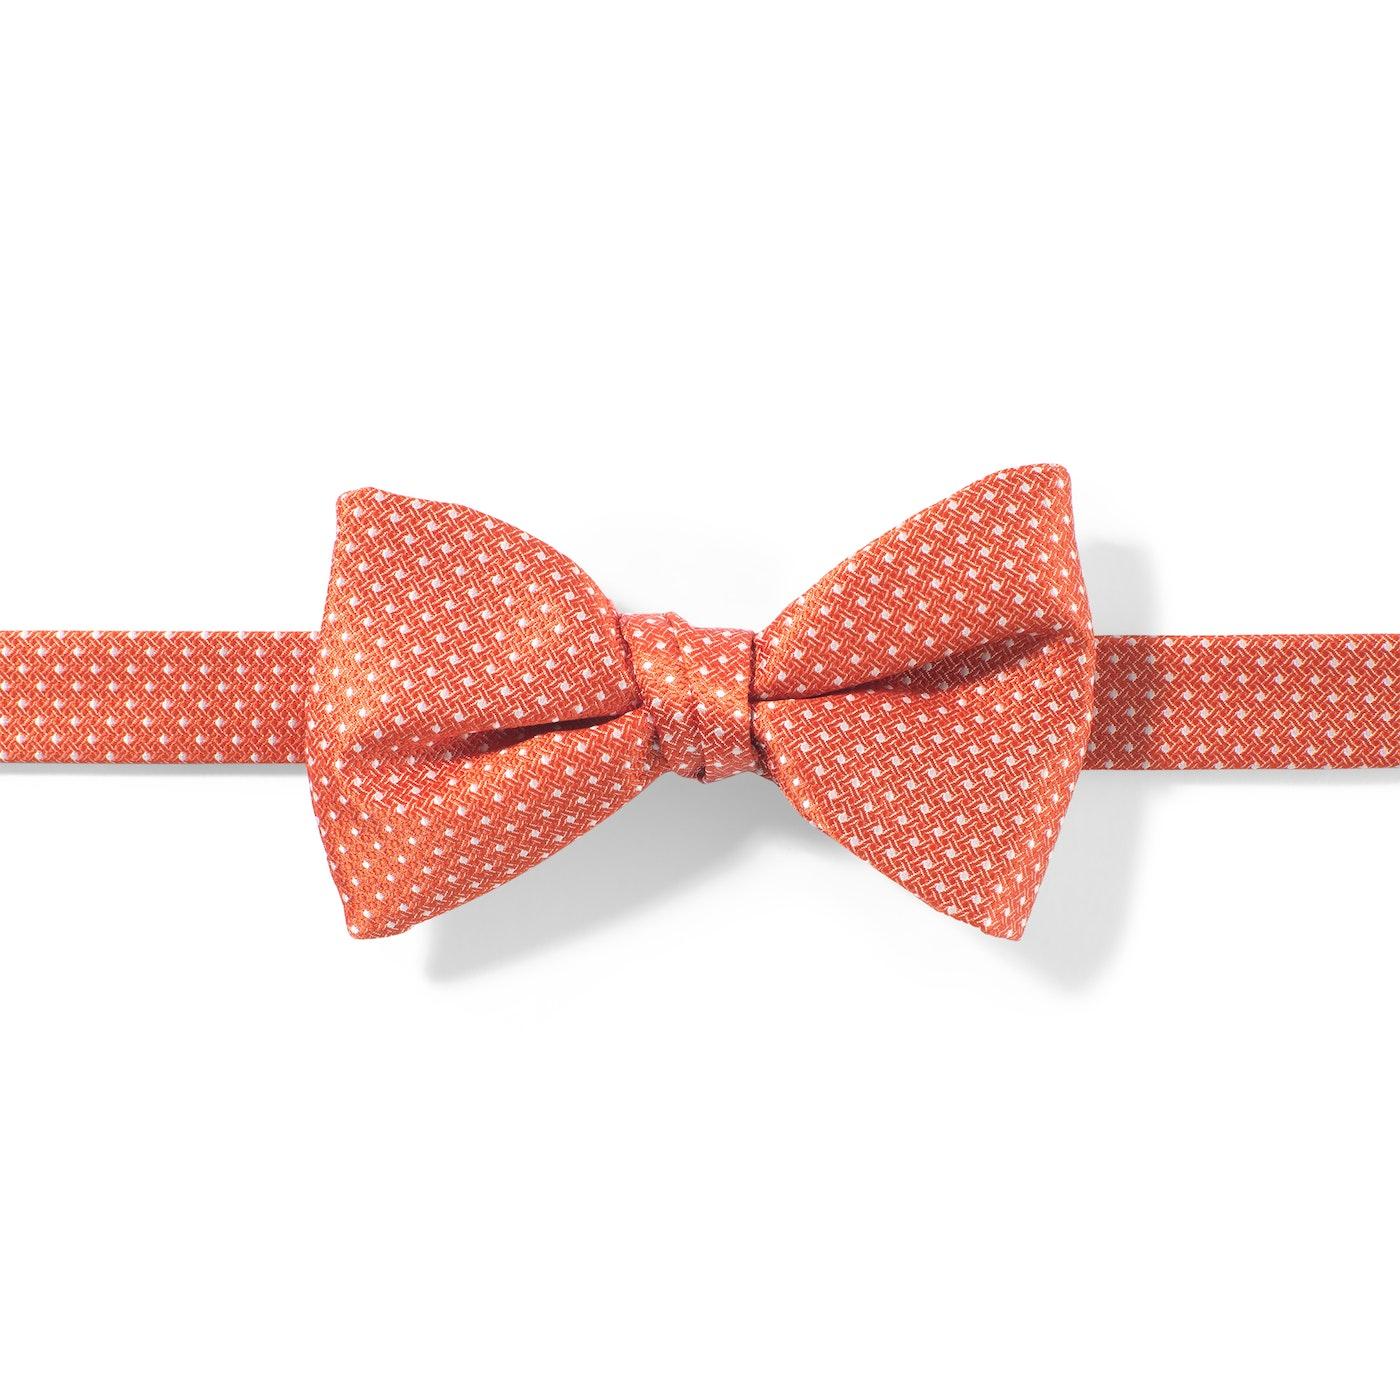 Dark Orange-Jalepeno and White Pin Dot Pre-tied Bow Tie